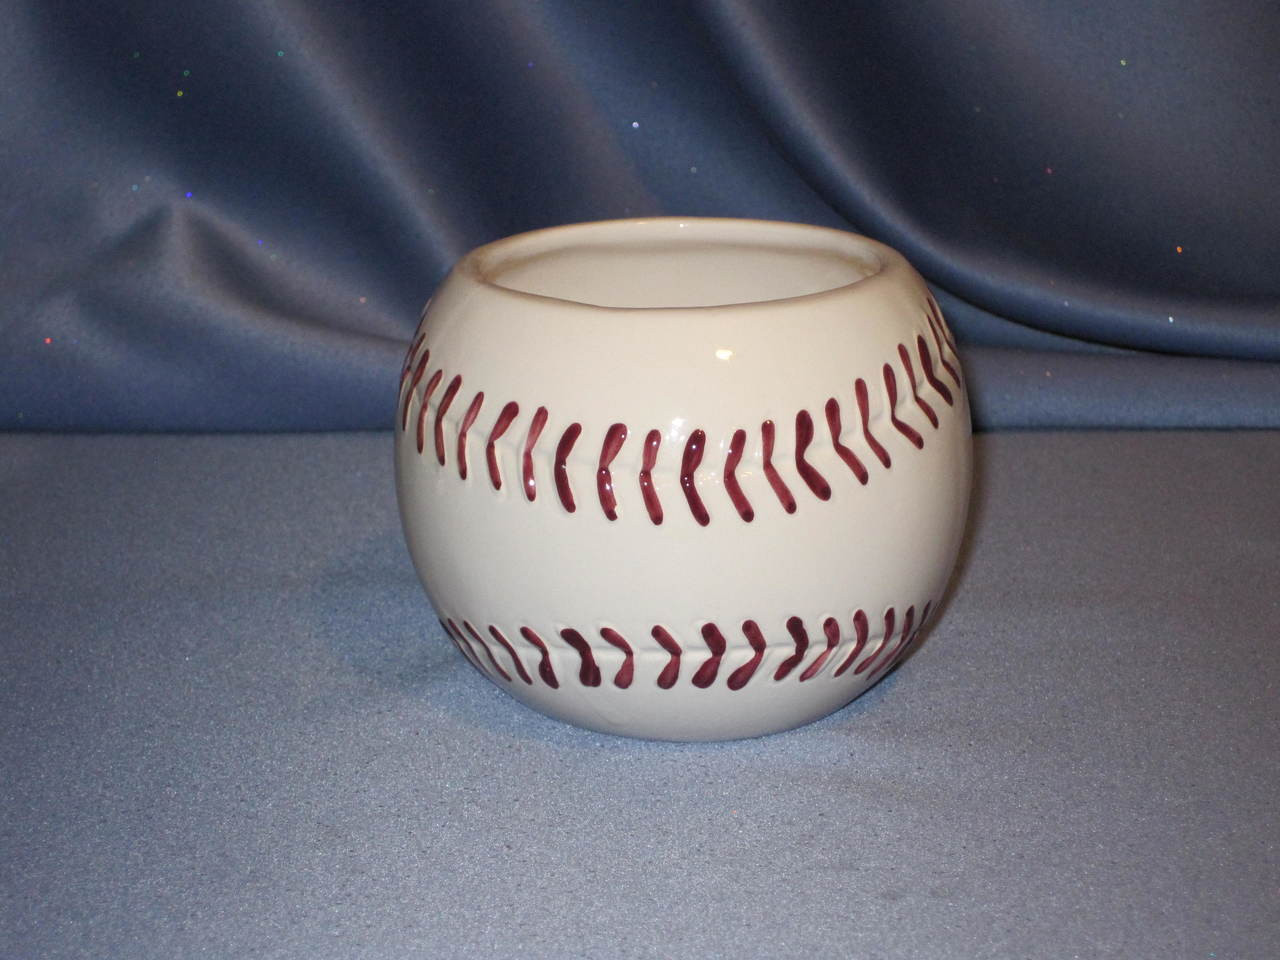 Baseball Drinking Mug by Sportcup LTD.